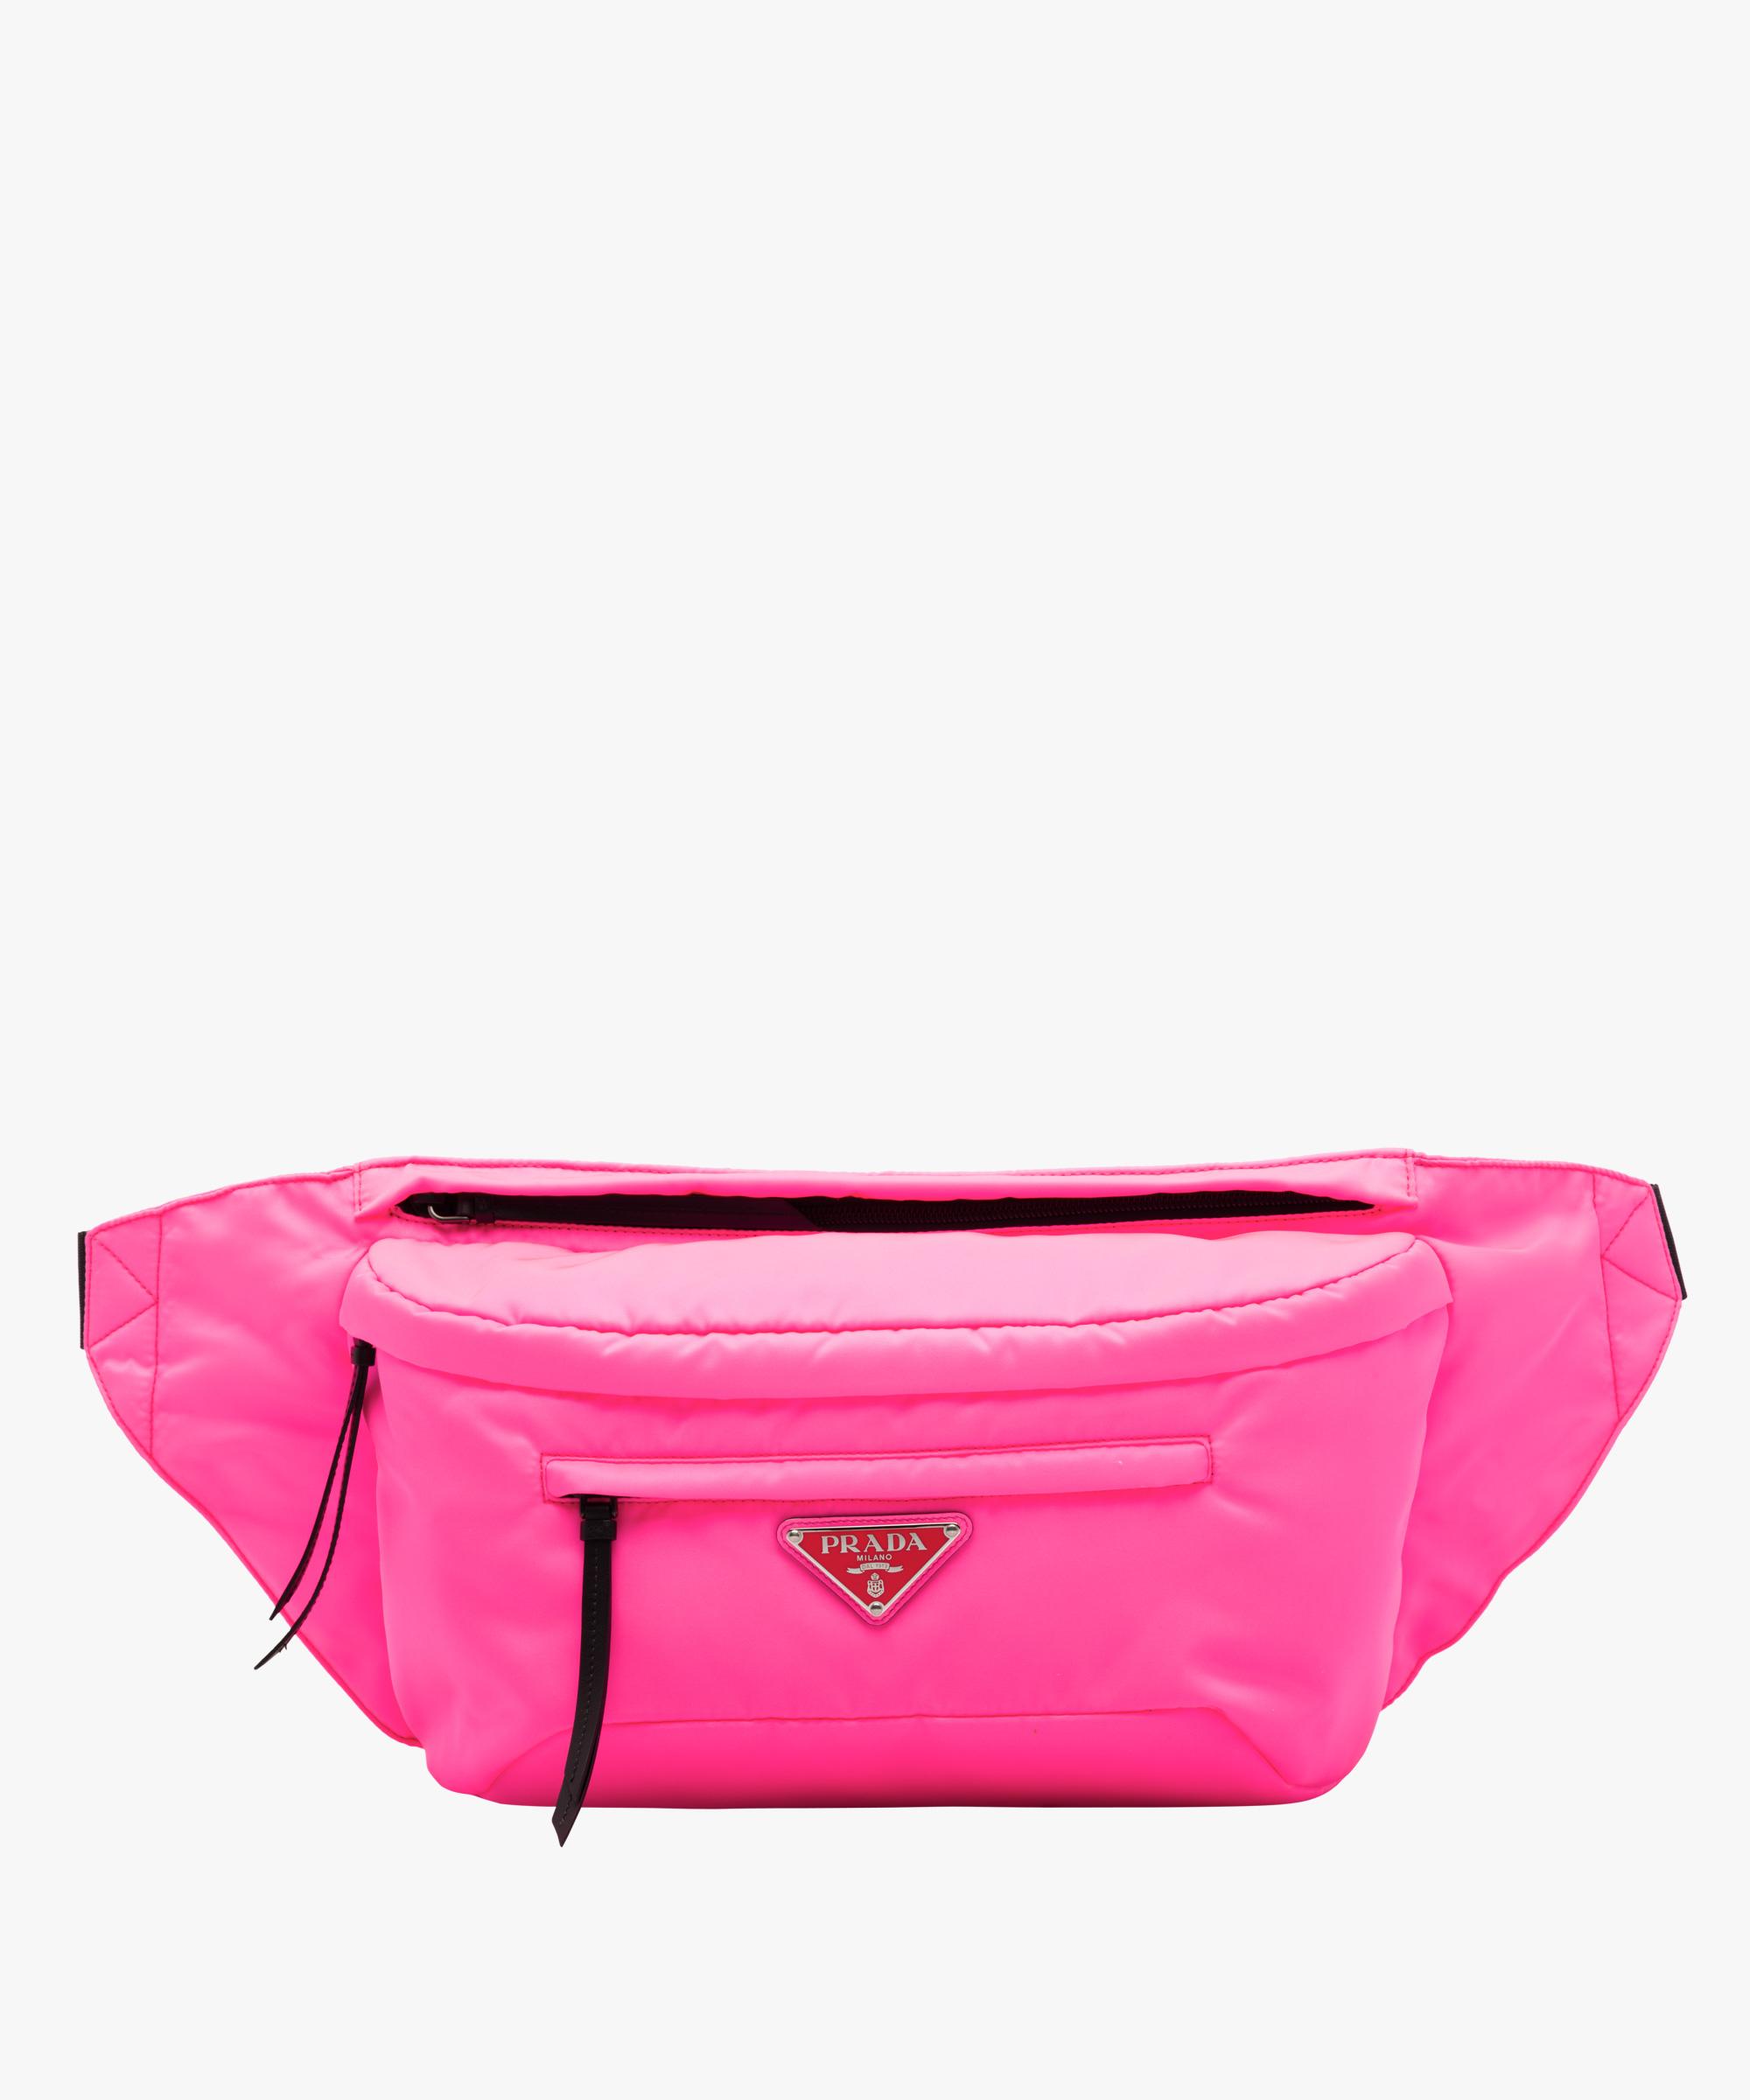 Nylon Belt Bag Prada Neon Pink